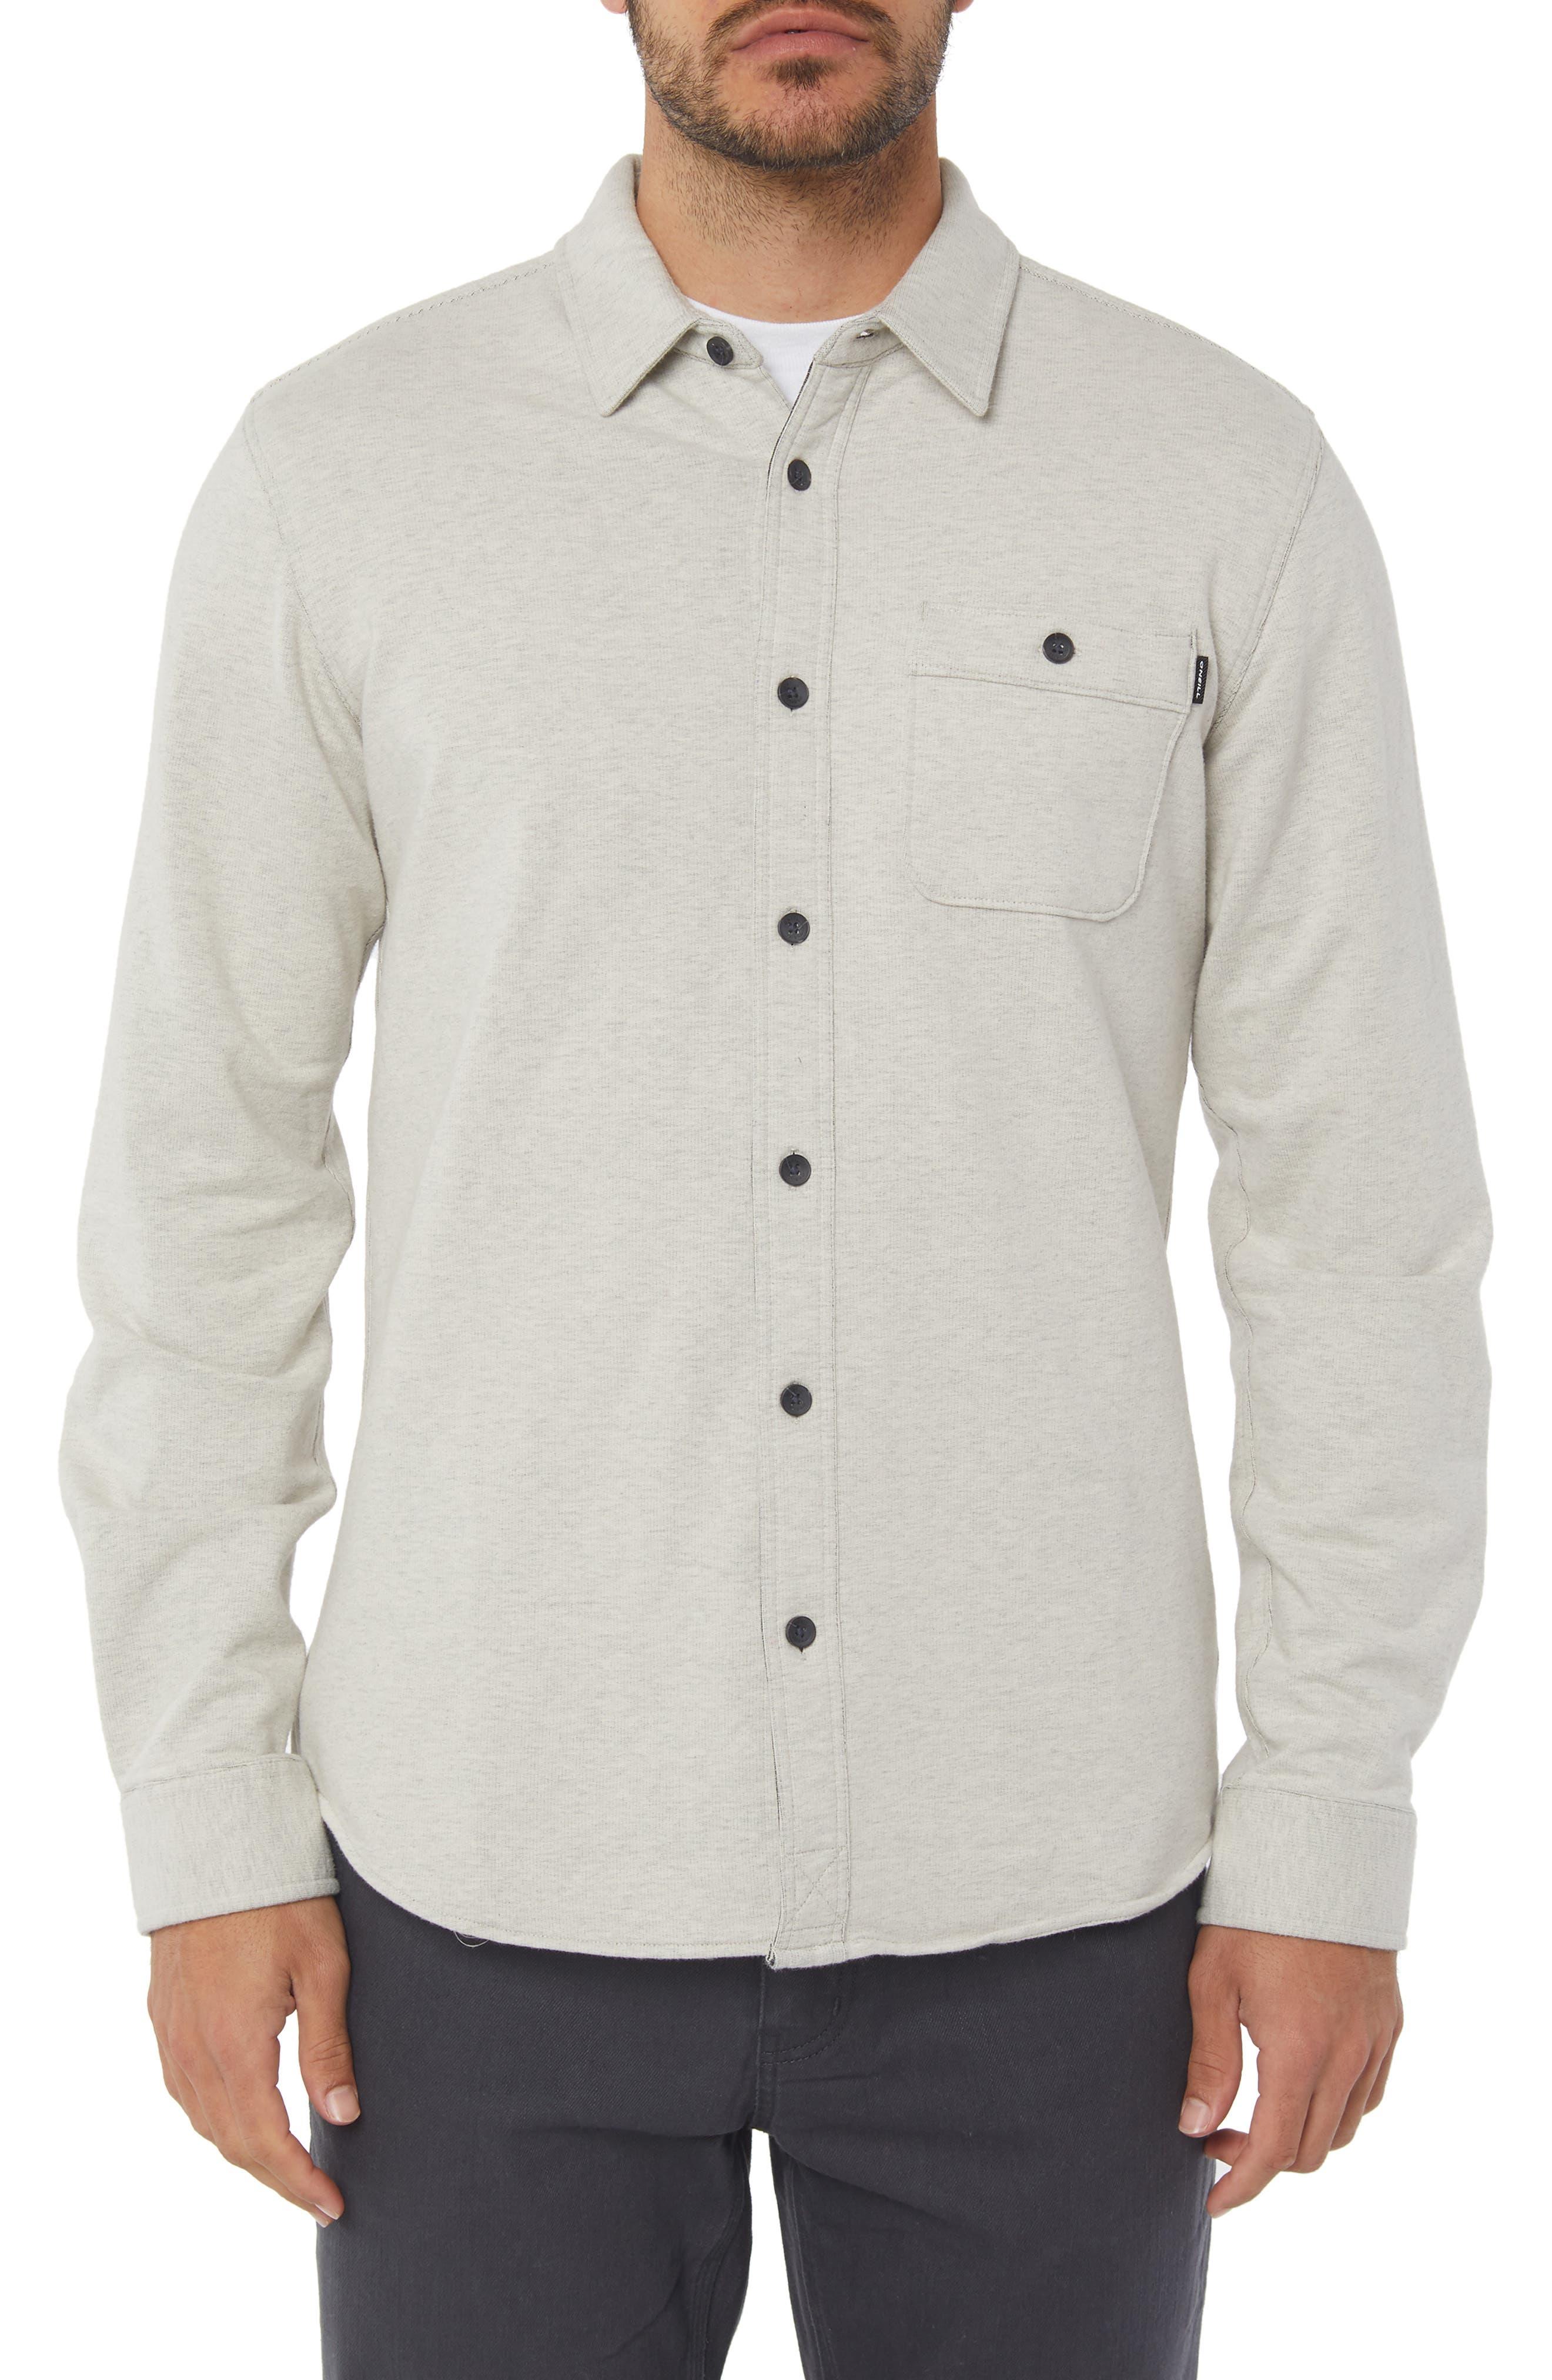 Anton Long Sleeve Shirt,                             Main thumbnail 1, color,                             020